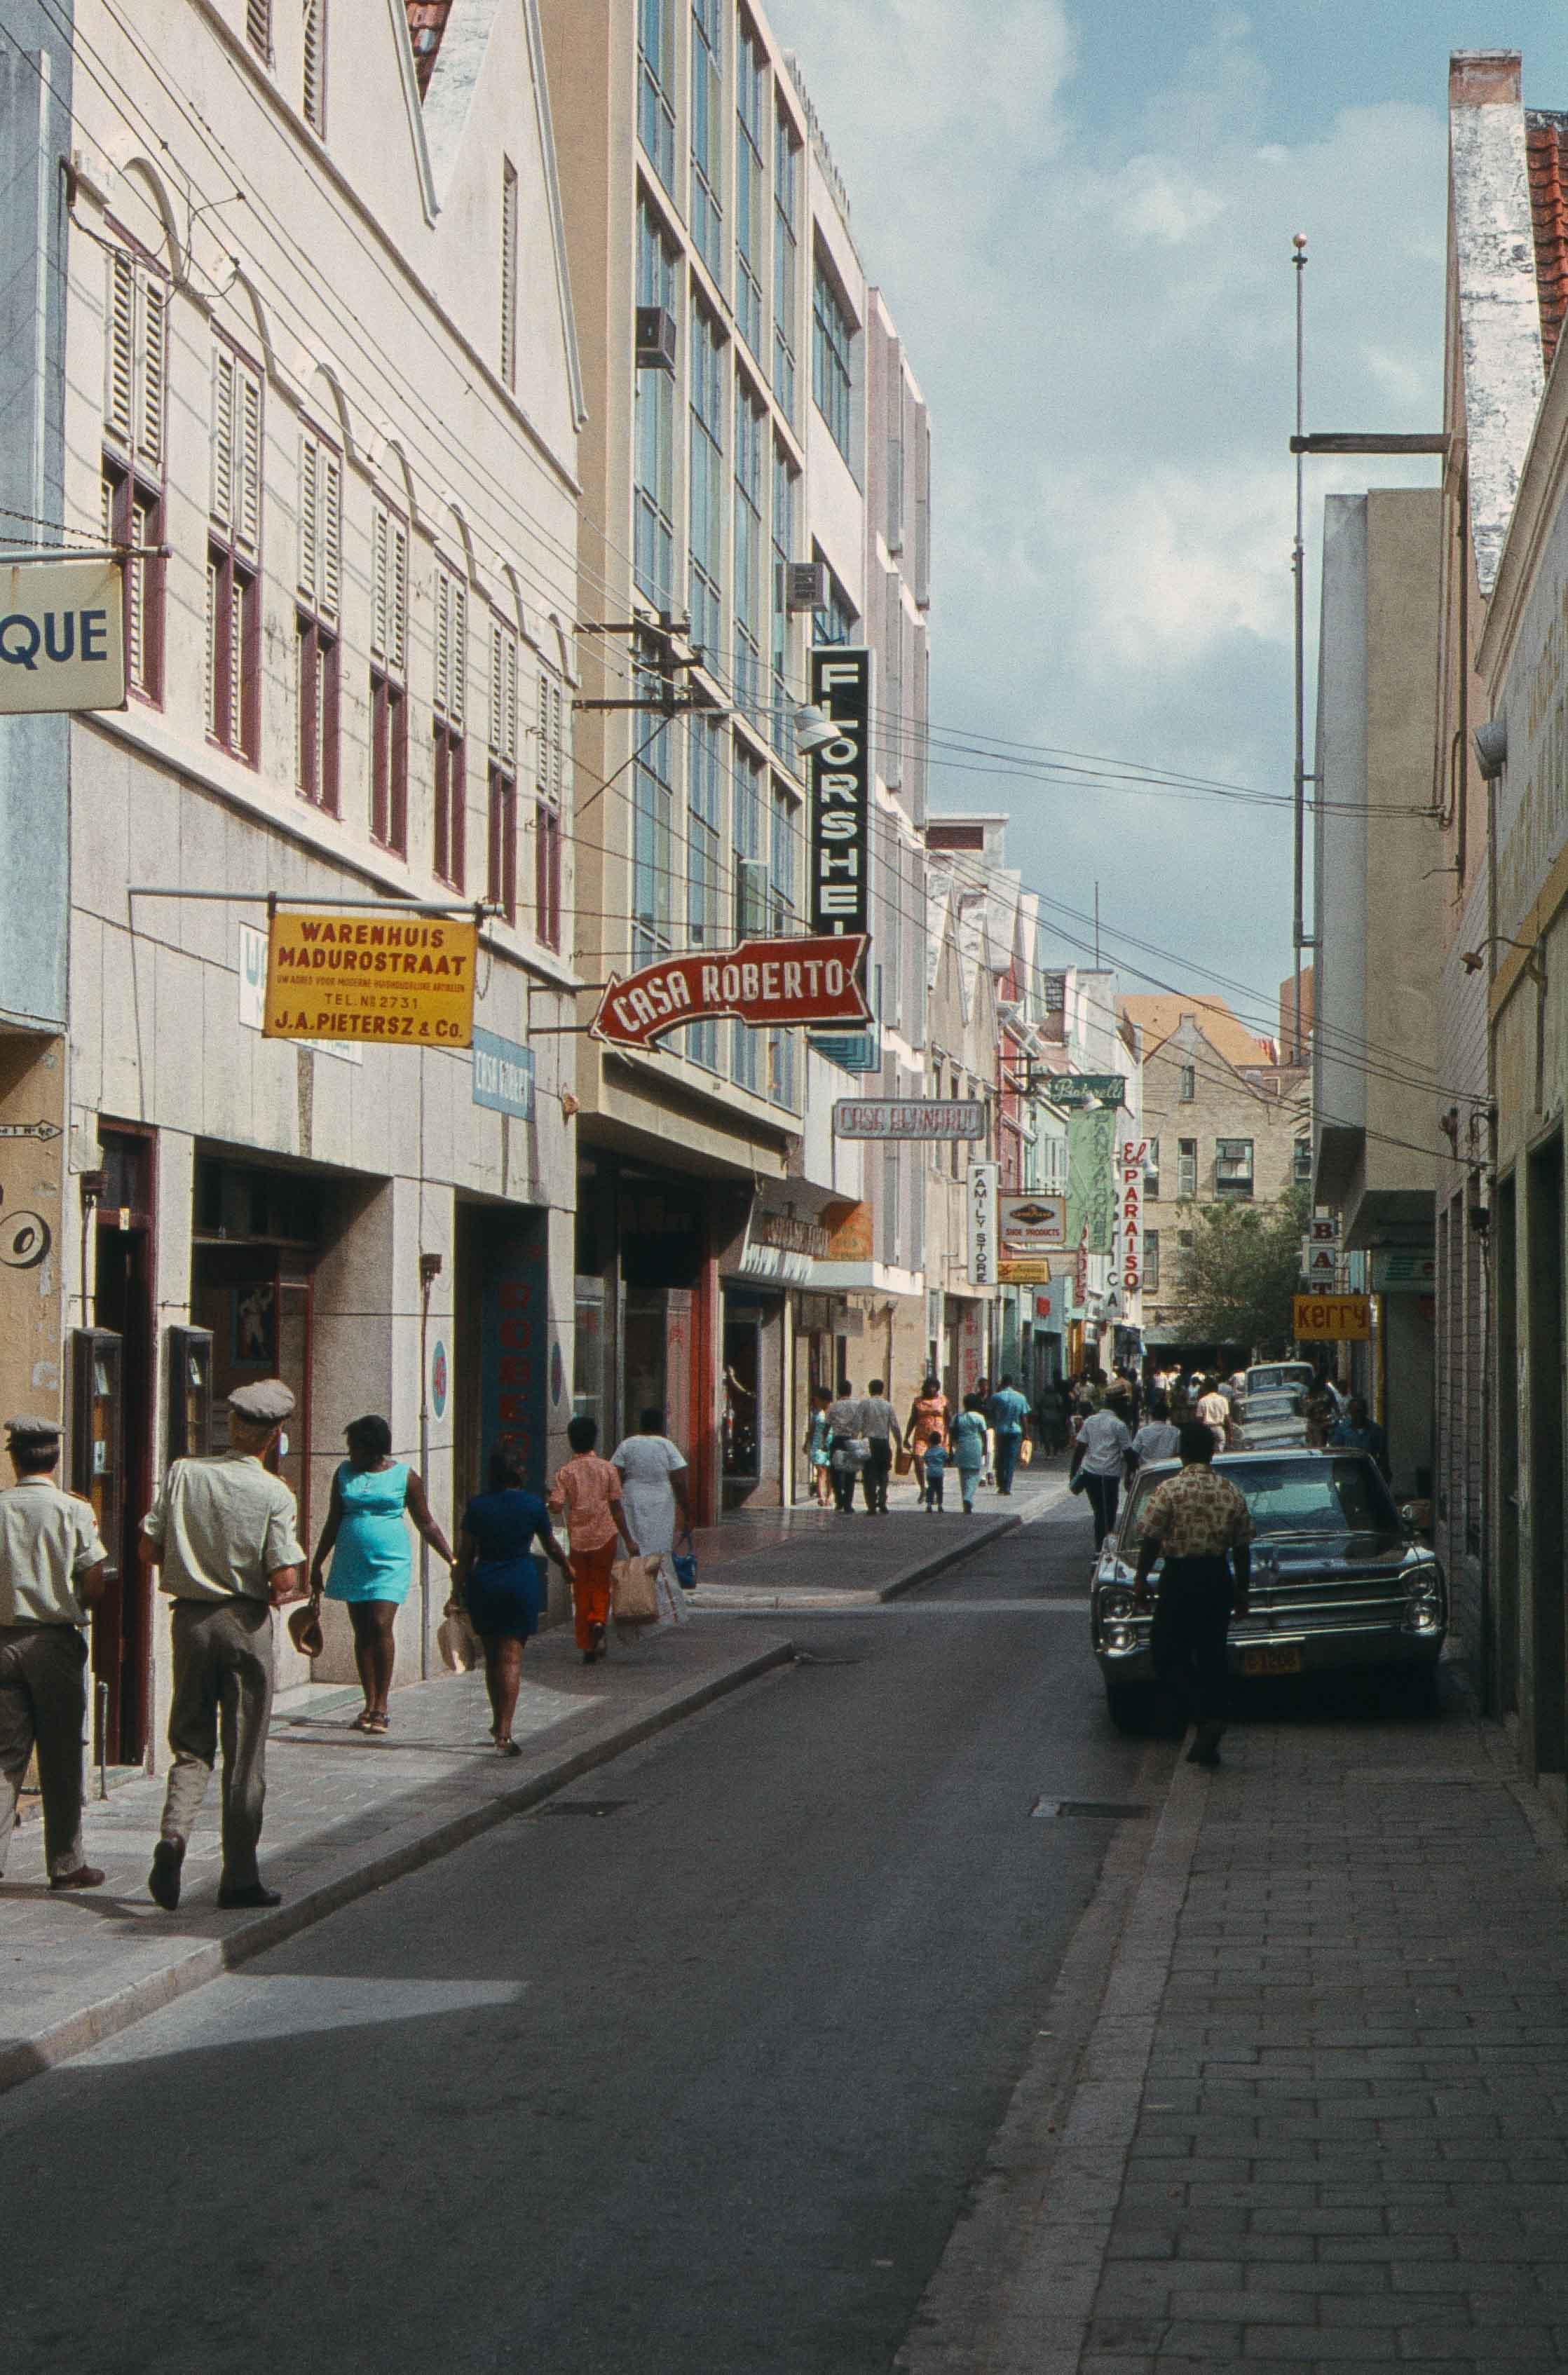 638. Suriname